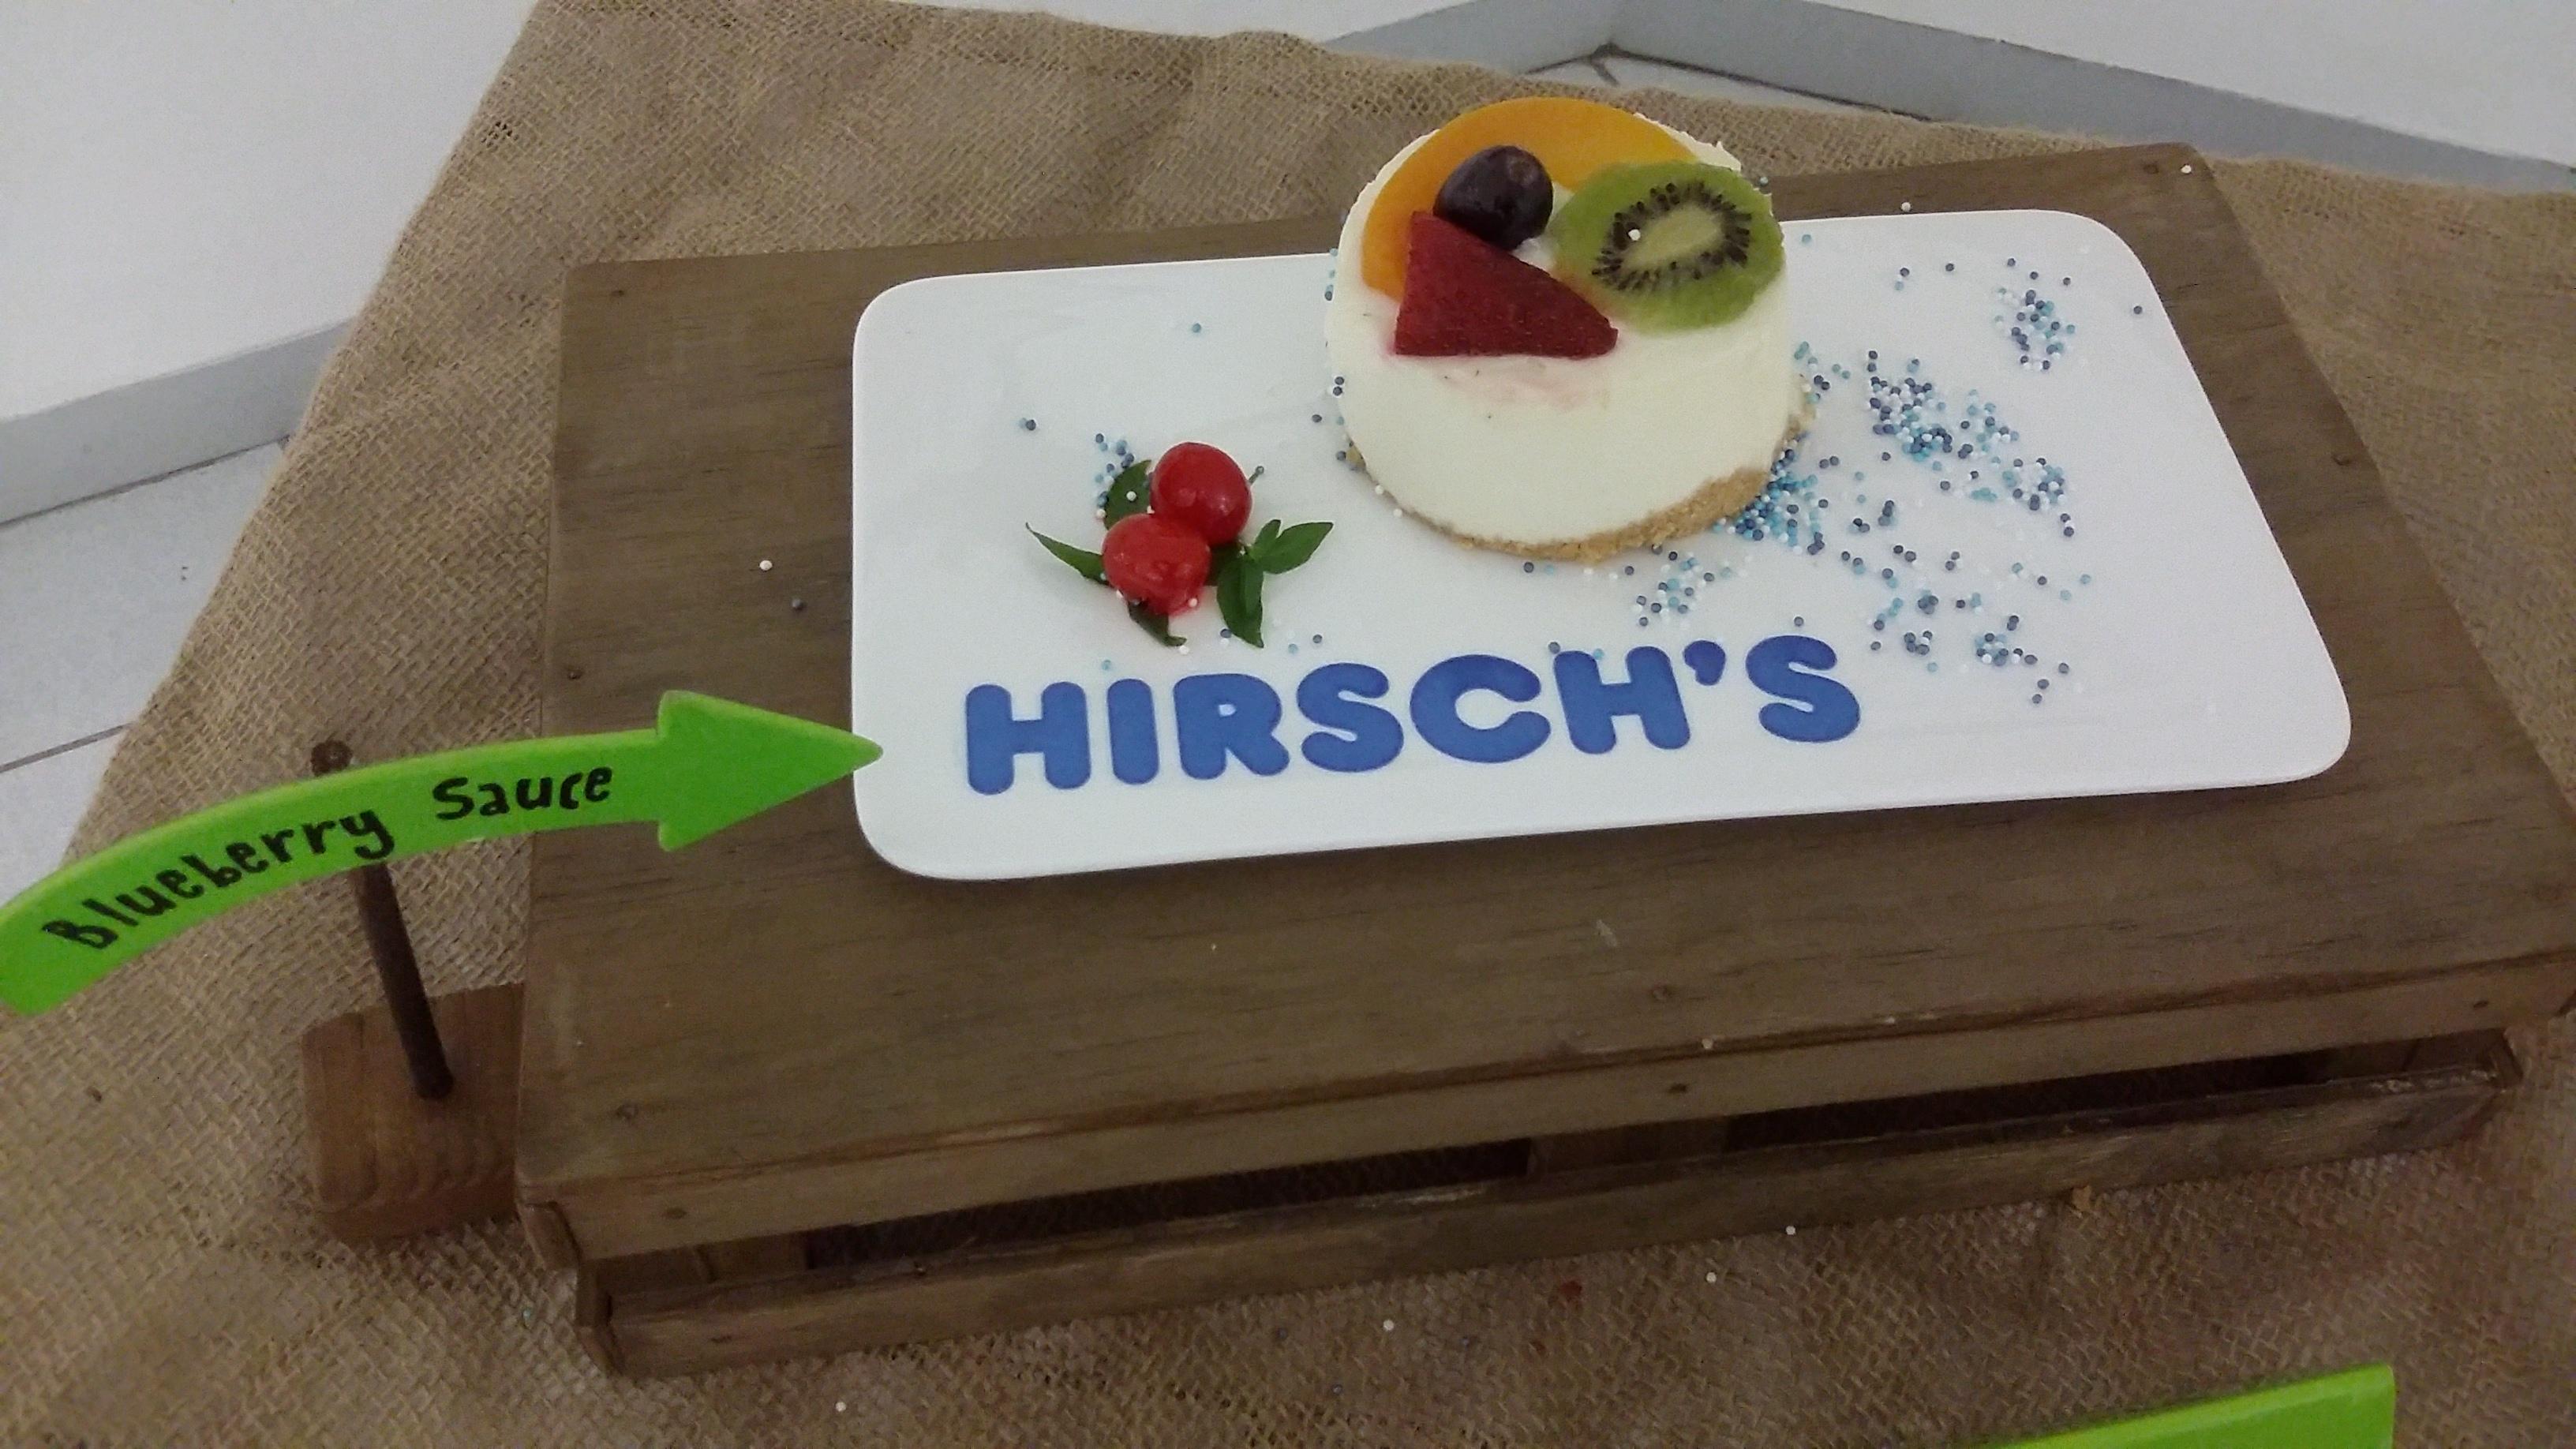 Hersch's